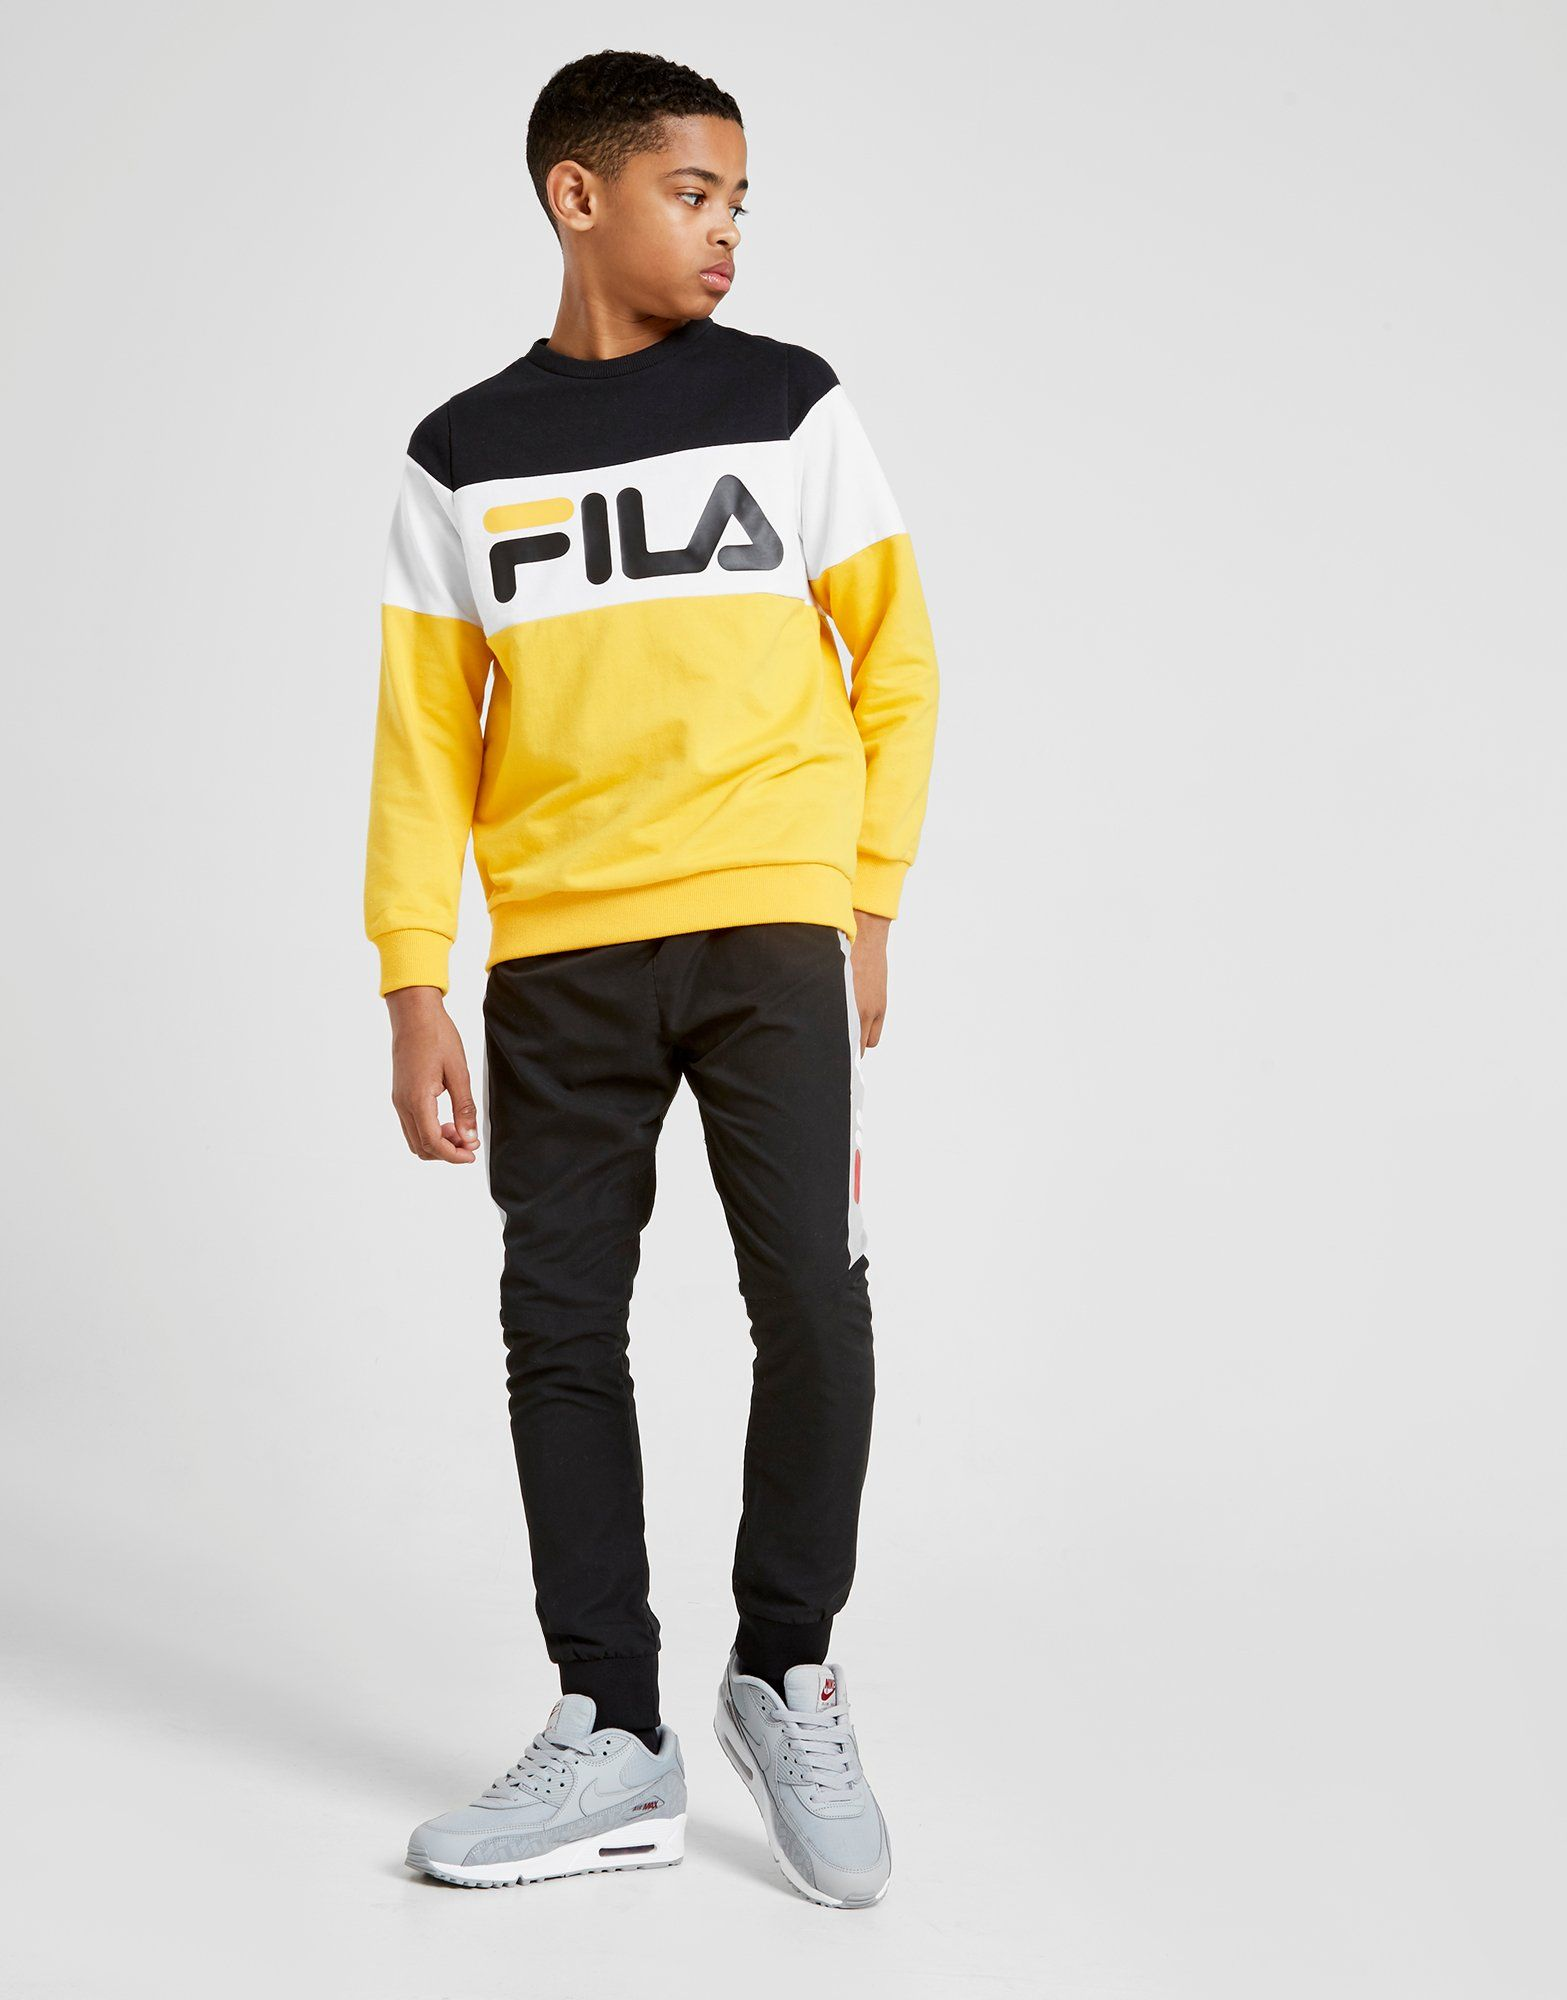 a03a24a17d9 Shoptagr | Fila Ryland Colour Block Crew Sweatshirt Junior by Fila